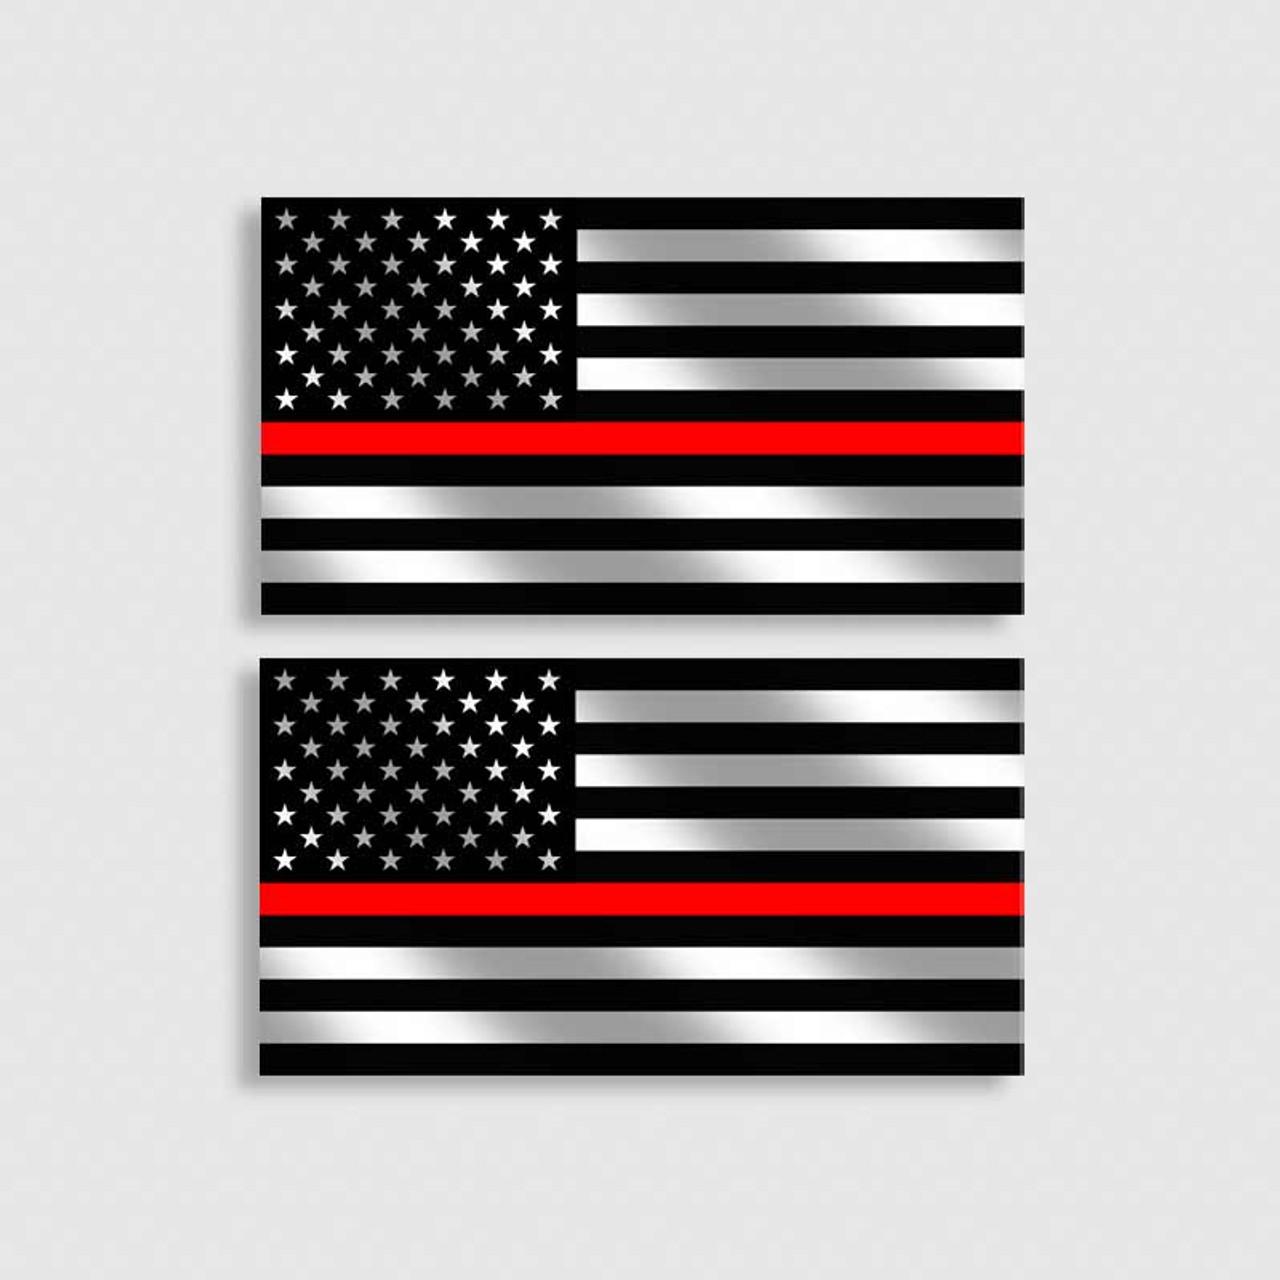 Firefighter Thin Red Line Car Emblem Fire Department Metal Badge